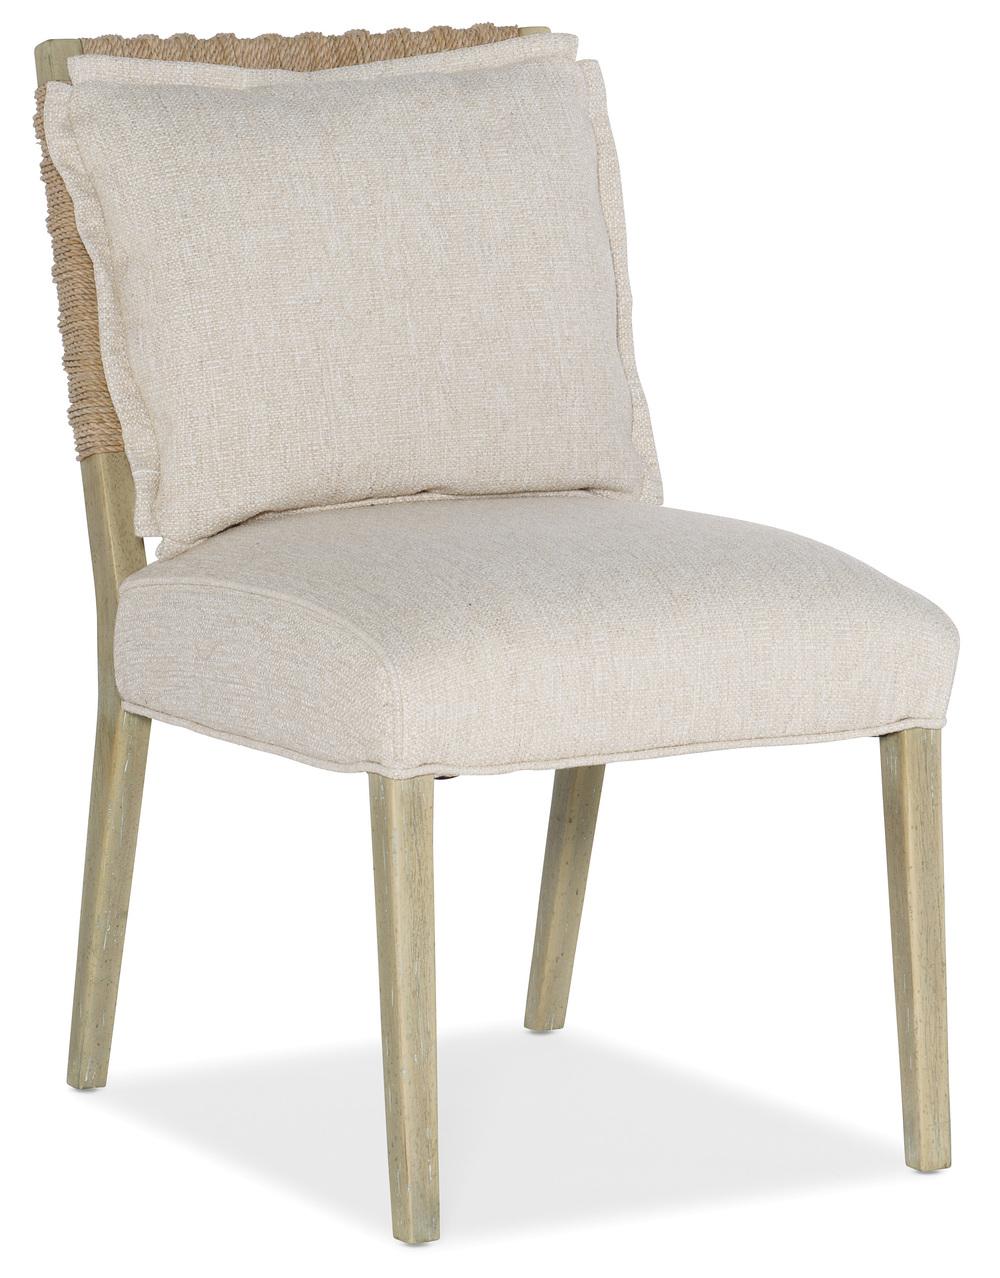 Hooker Furniture - Woven Back Side Chair